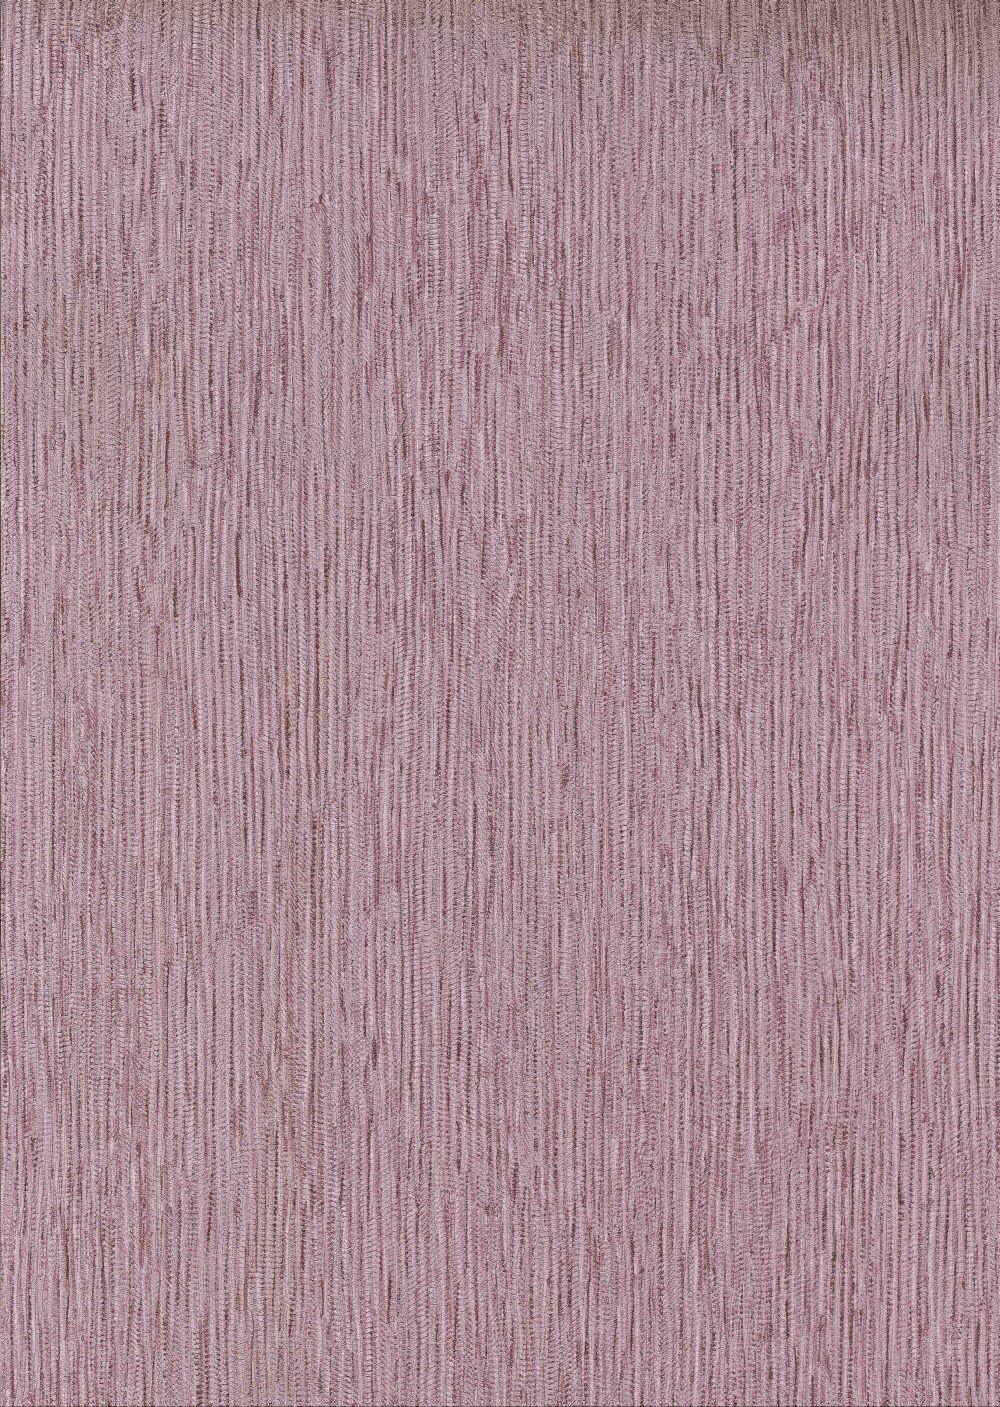 Foto papel pintado vinilico natura 2084 foto 141407 - Papel pintado vinilico ...